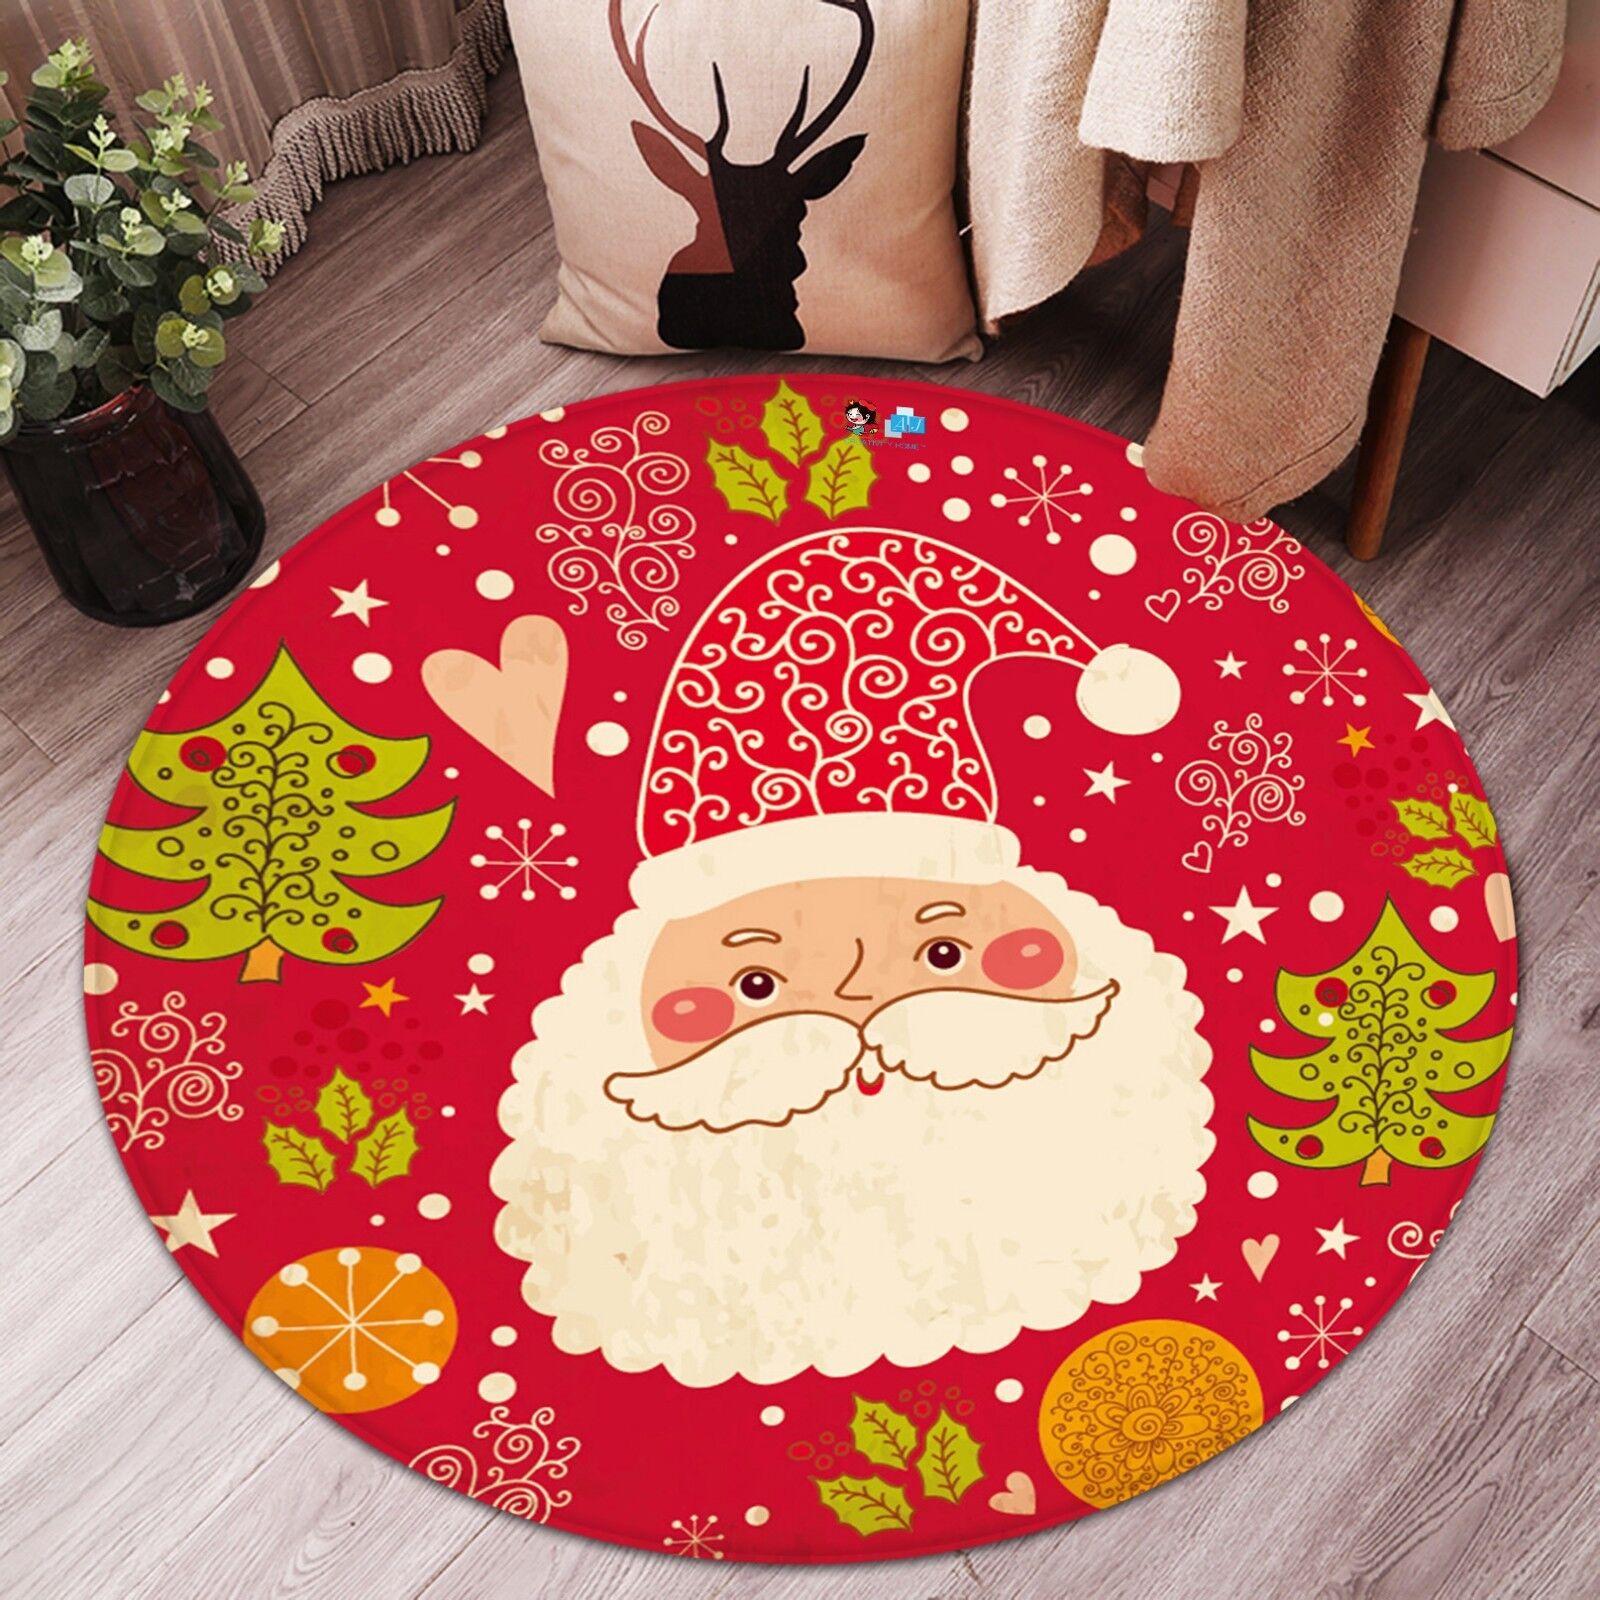 3d Natale Xmas 324 antiscivolo tappeto tappetino vano giri elegante TAPPETO de